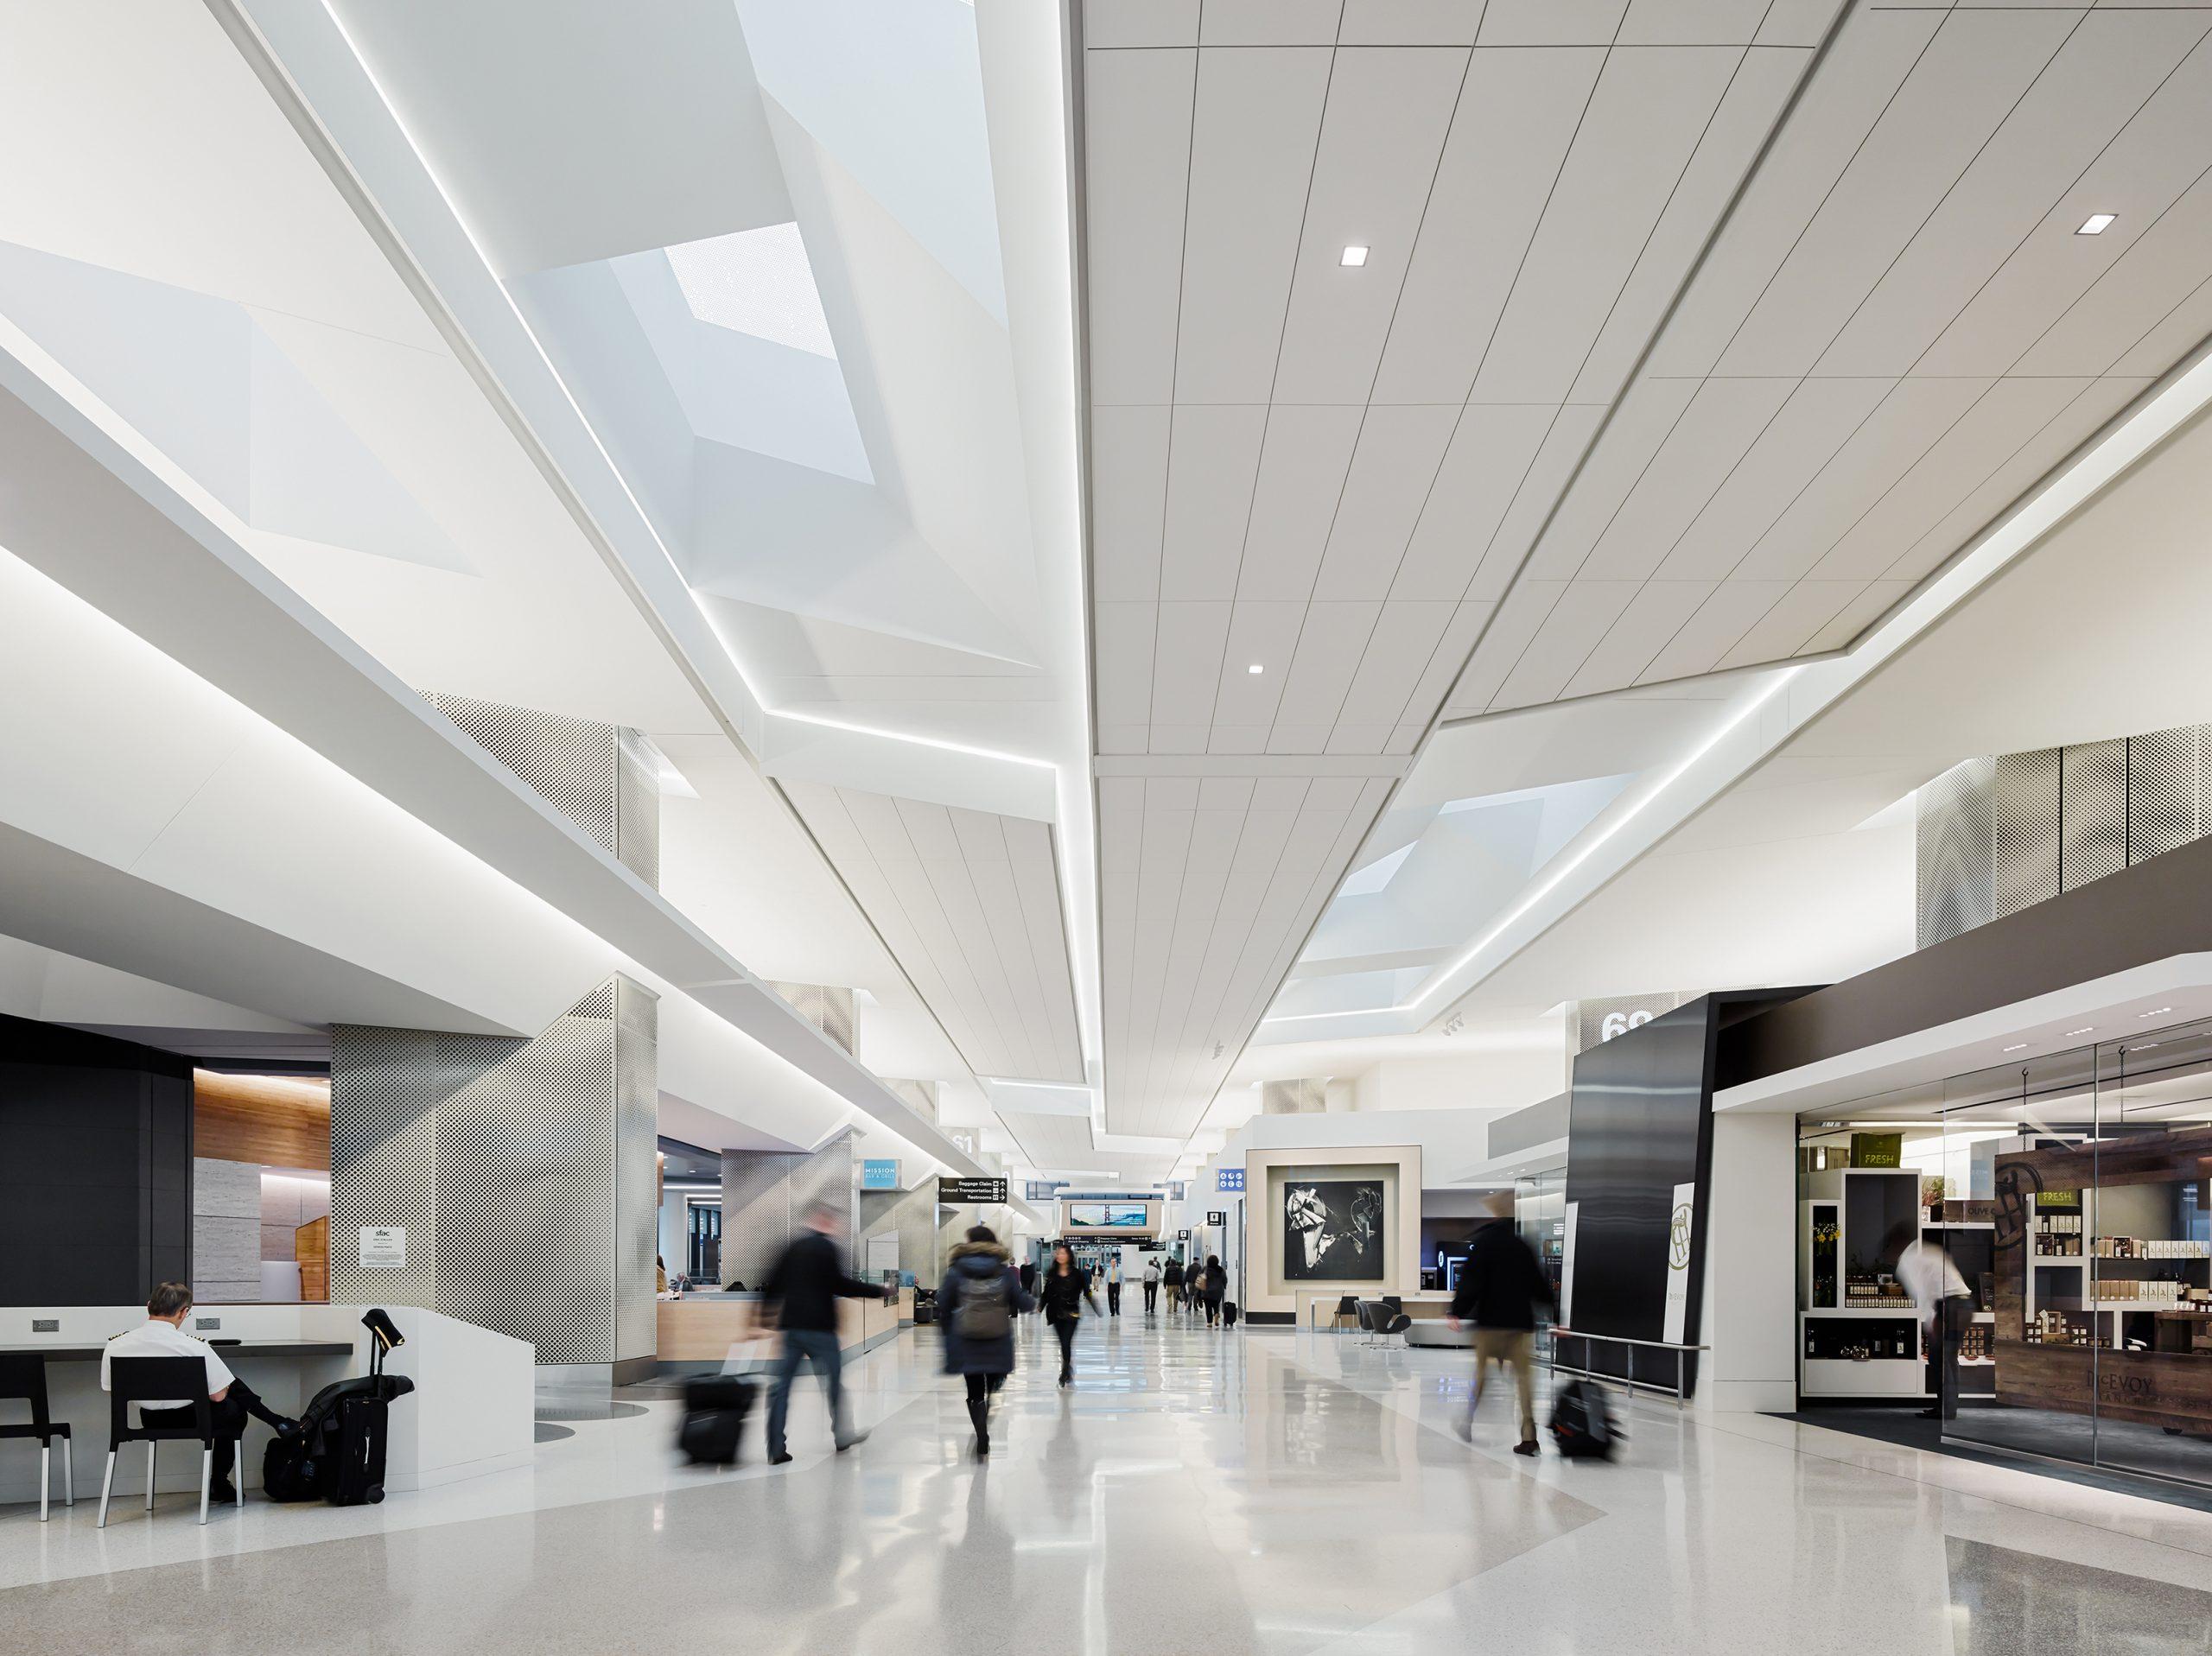 San Francisco International Airport Boarding Area E